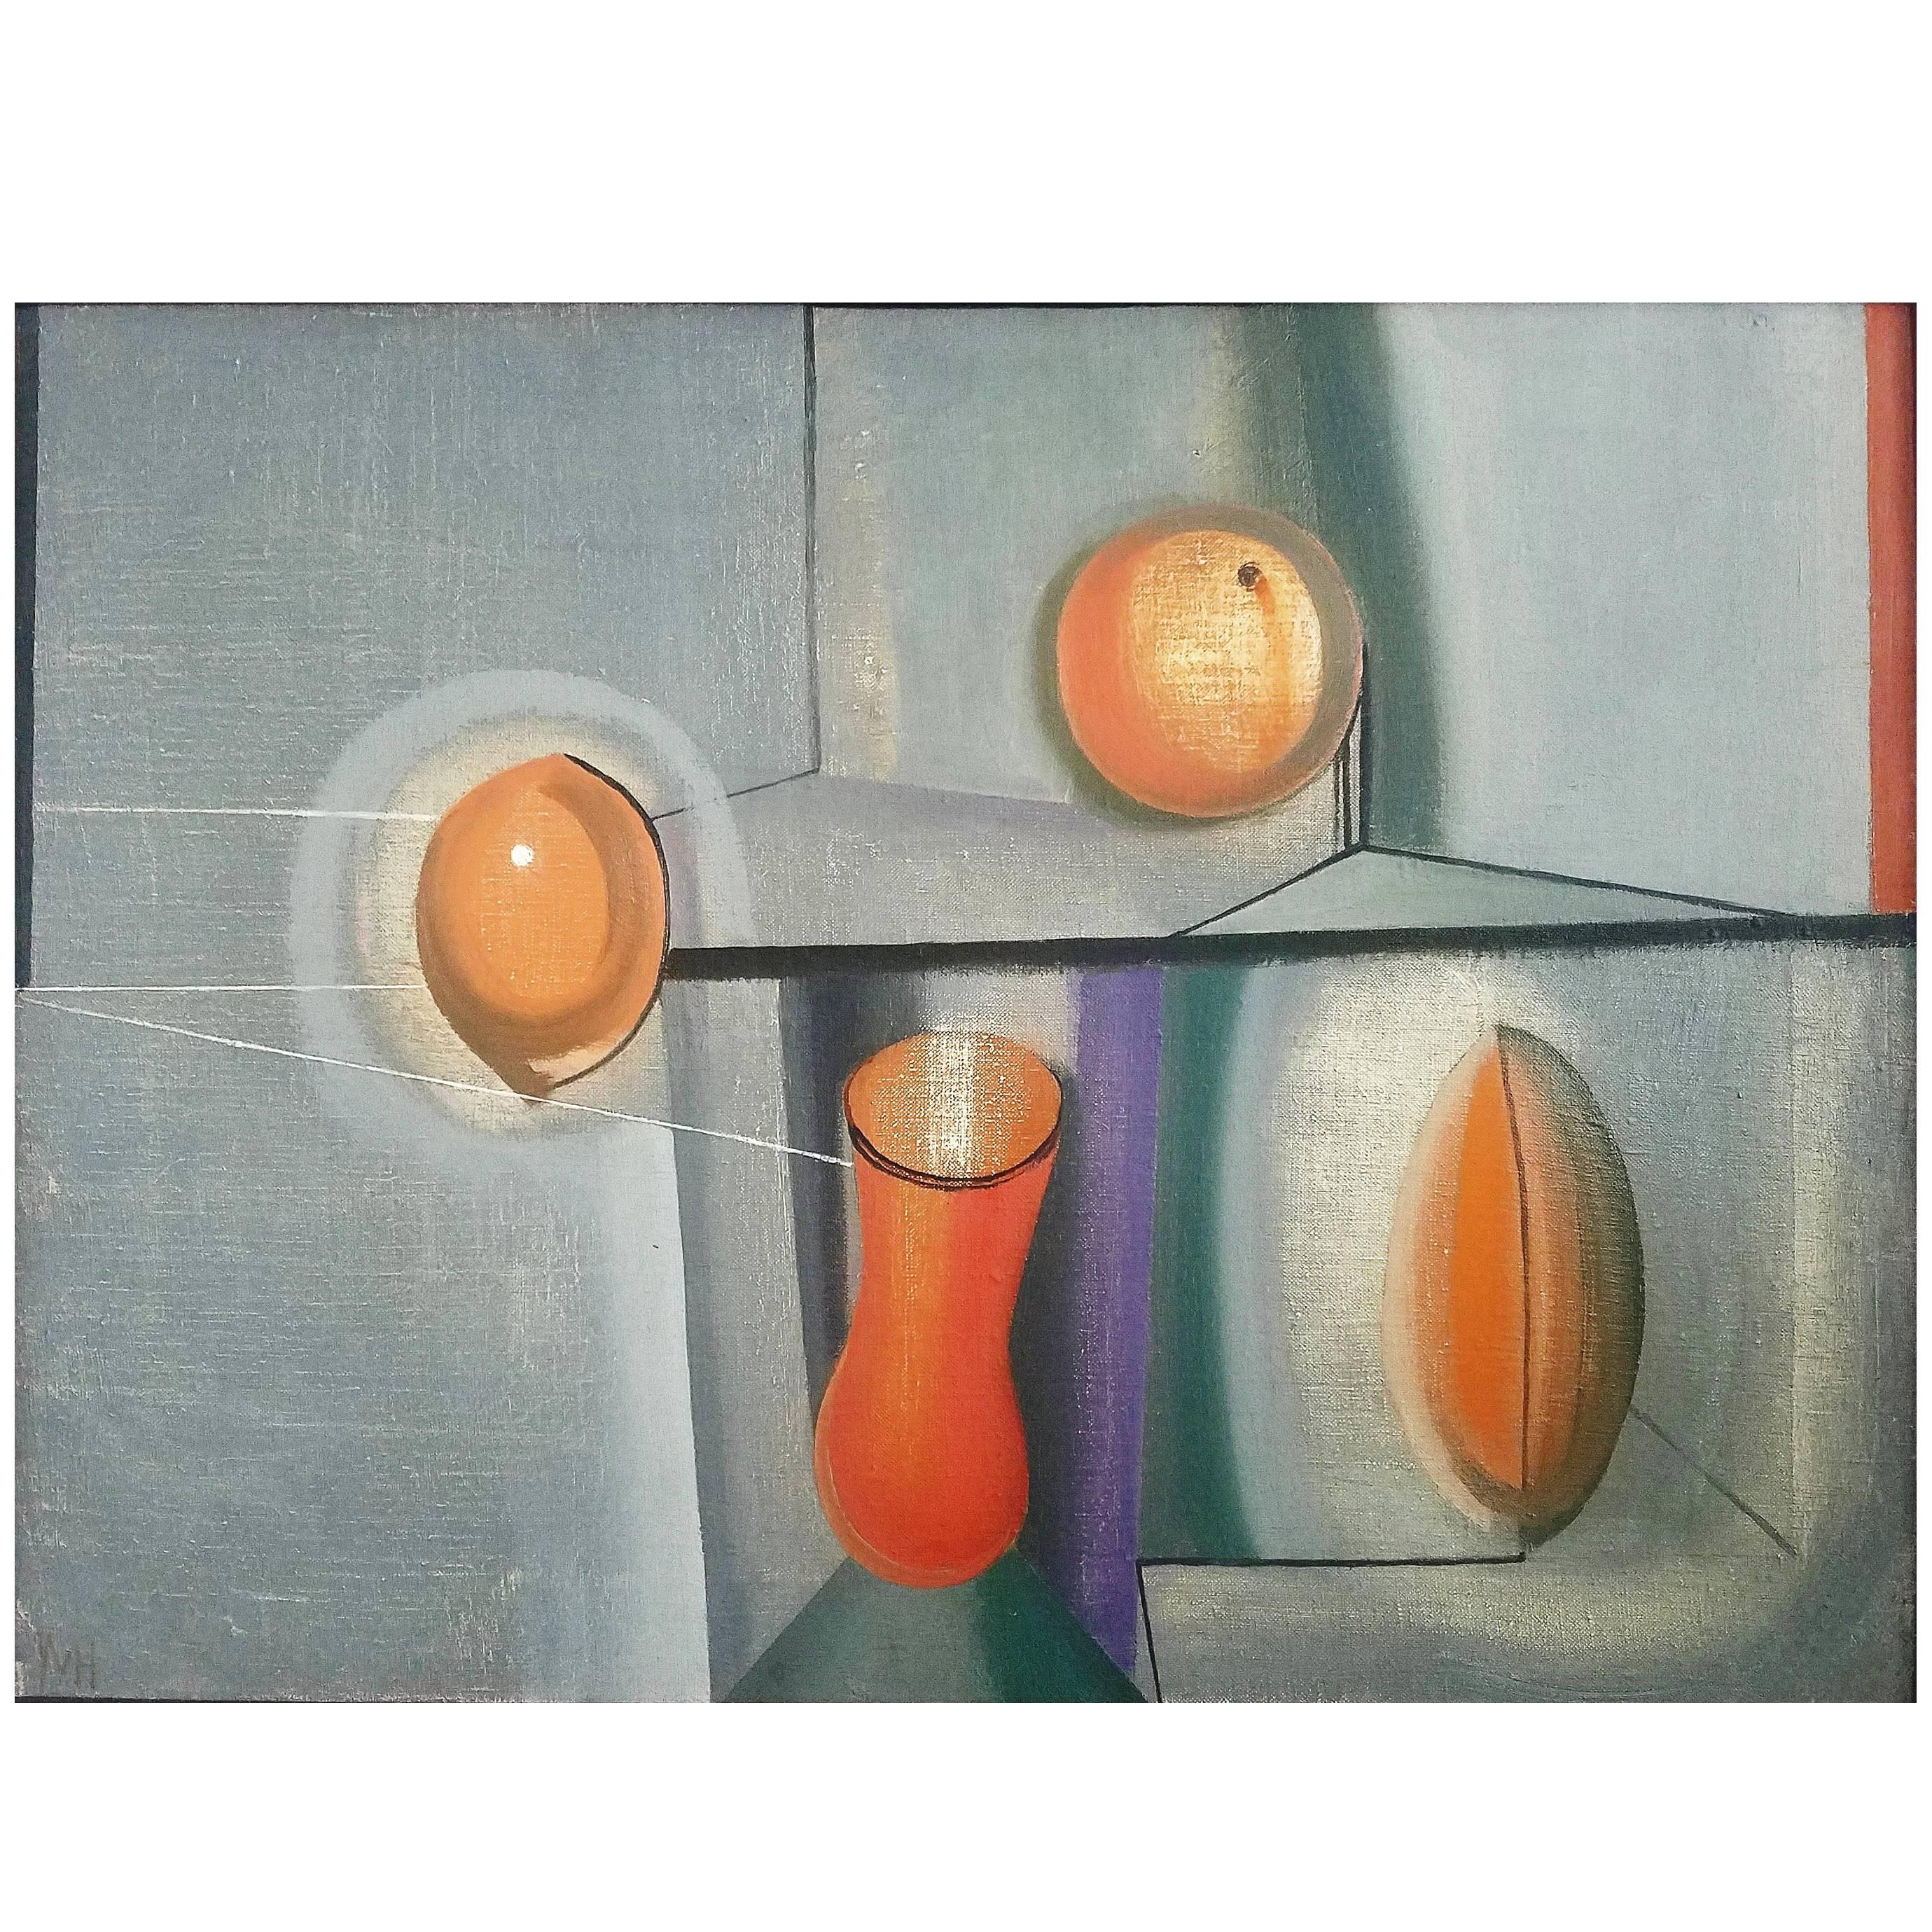 """Still Life"" Oil on Canvas by Joseph Mellor Hanson, 1961"